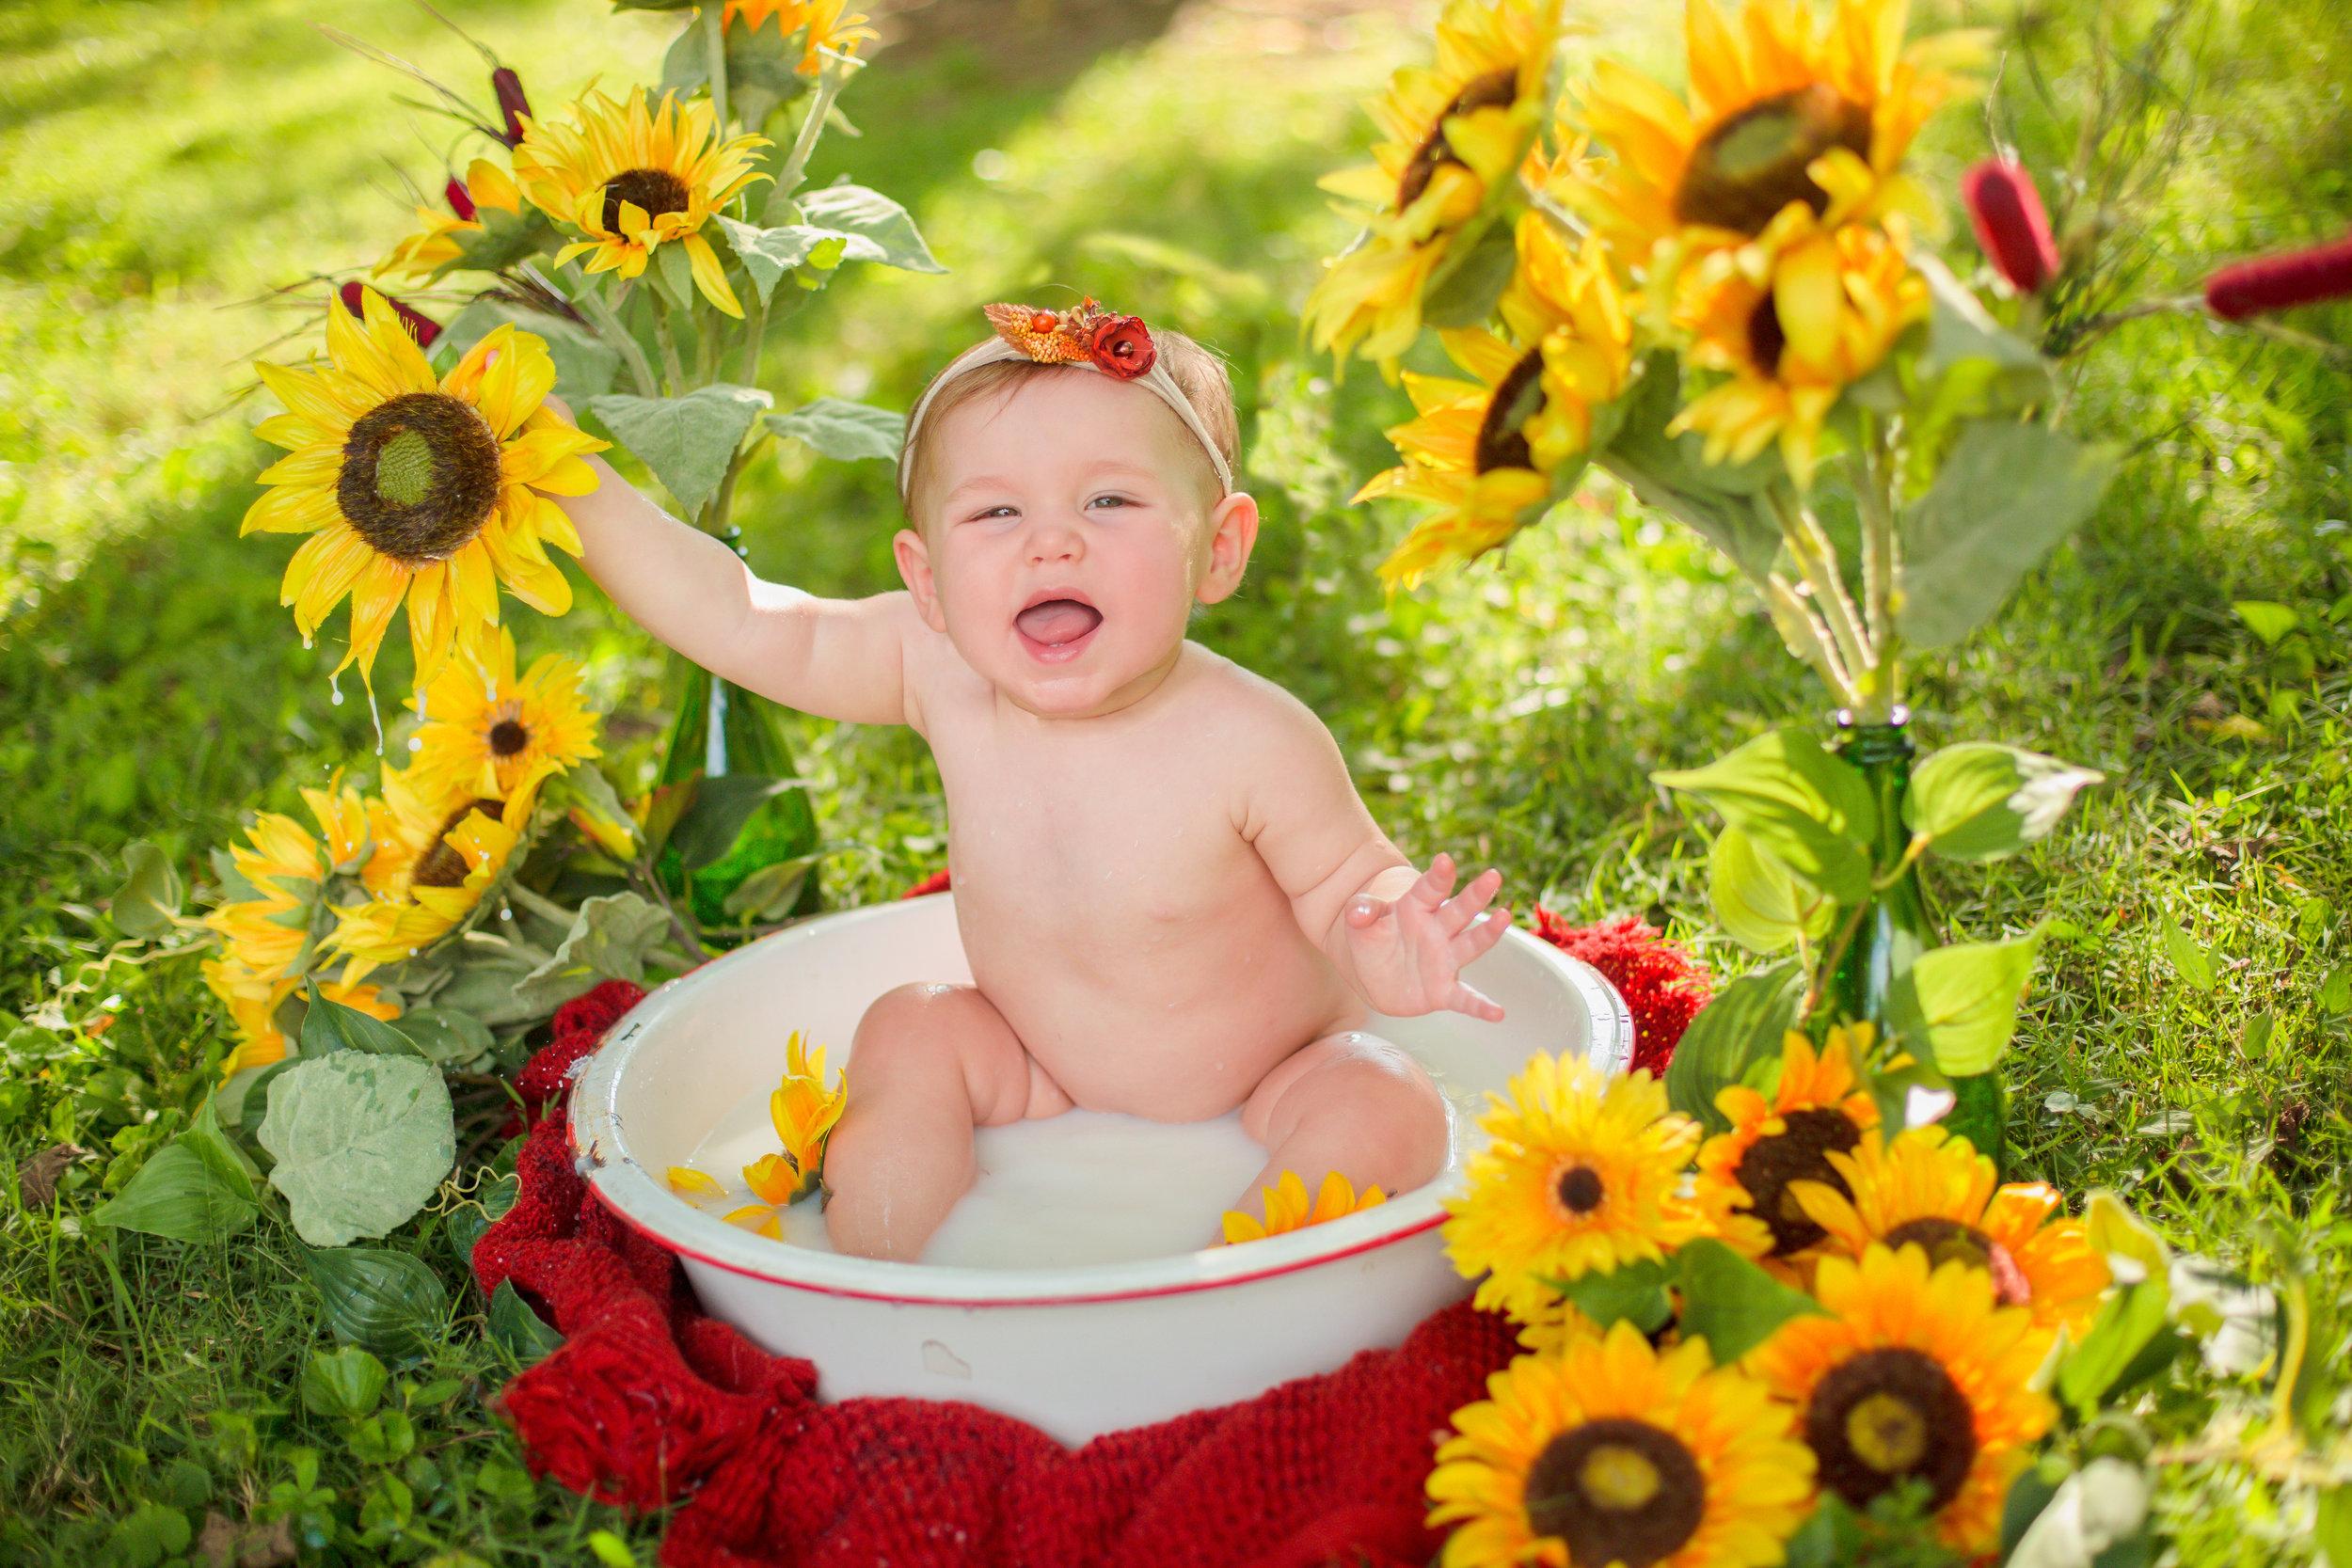 Sawyer-Jo-Sunflower-Milk-bath-Nashville-Family-Photographer-Chelsea-Meadows-Photography-(25).jpg